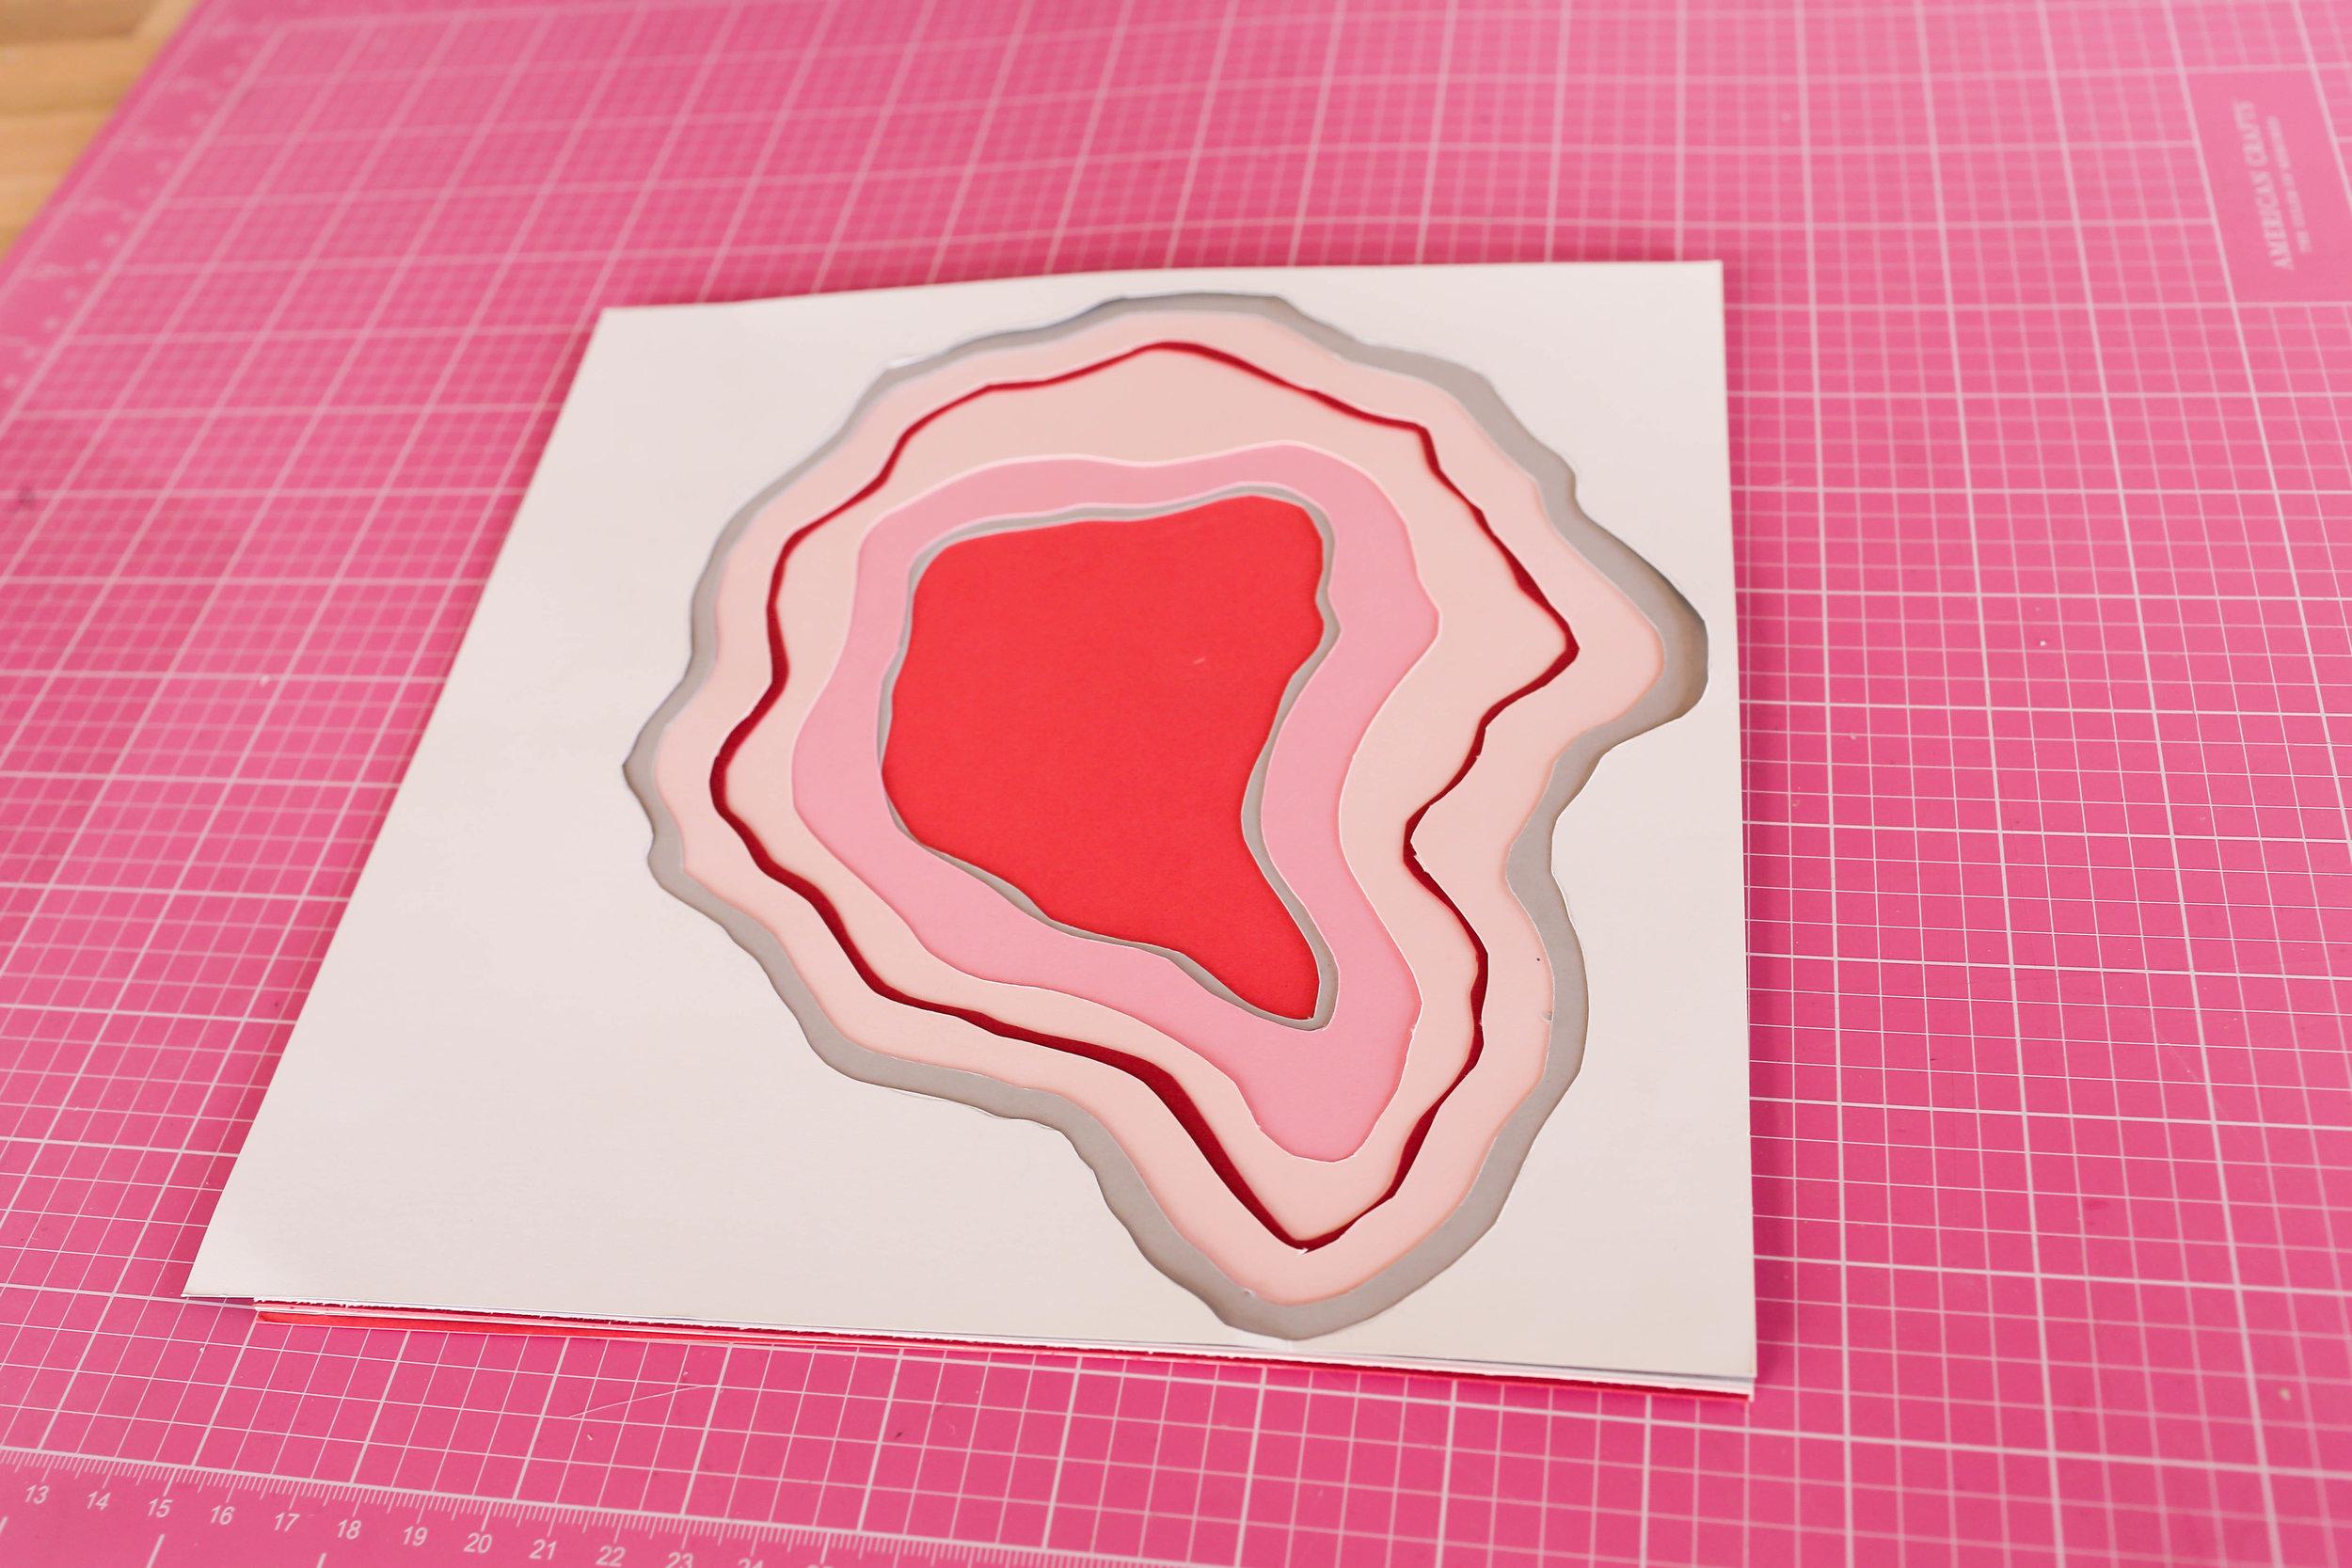 Geode Pt 1-4.jpg